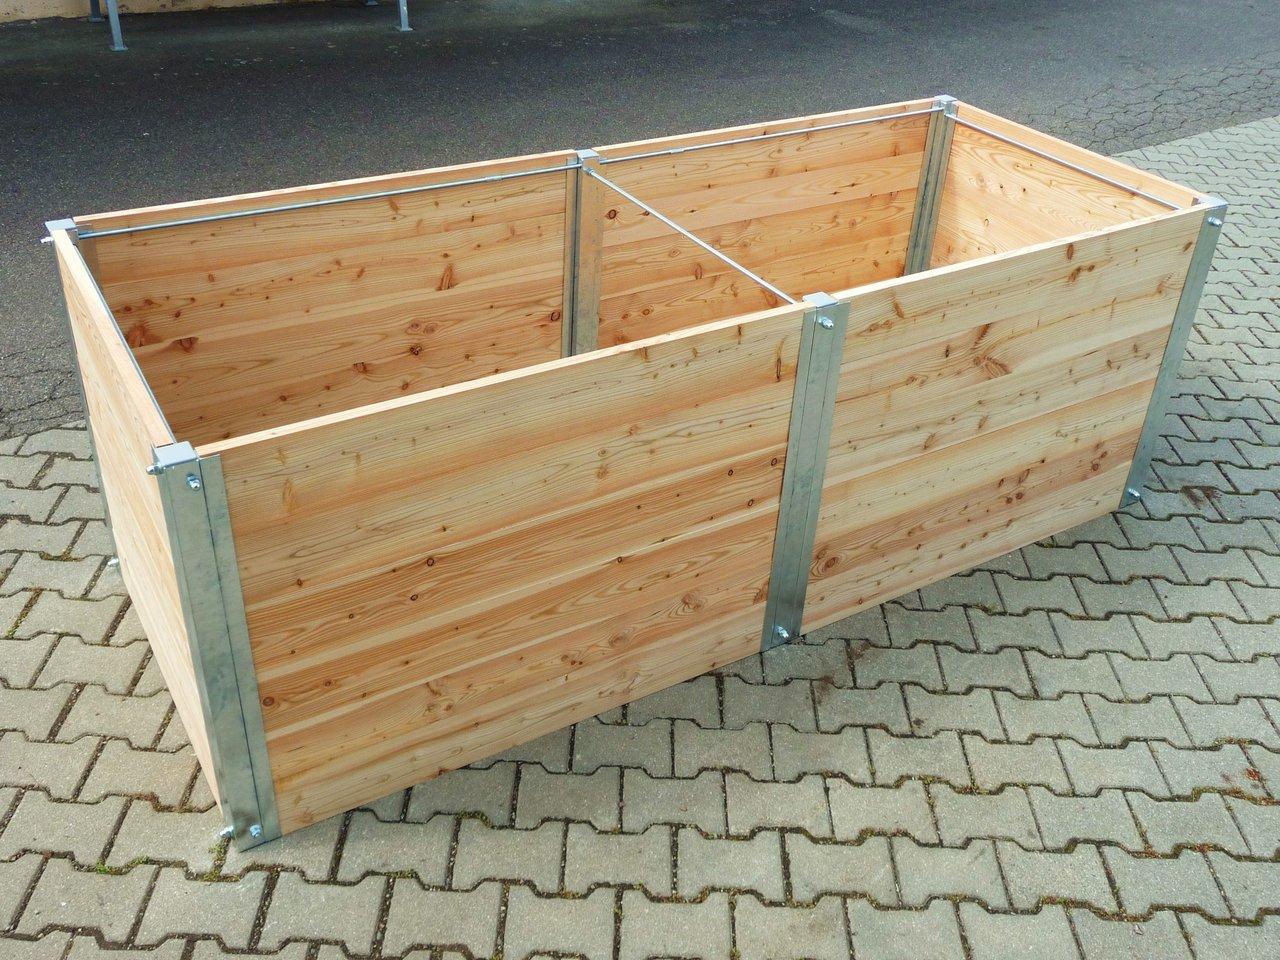 hochbeet gr 1 mtr breit x 2 5 mtr lang 85cm hoch. Black Bedroom Furniture Sets. Home Design Ideas